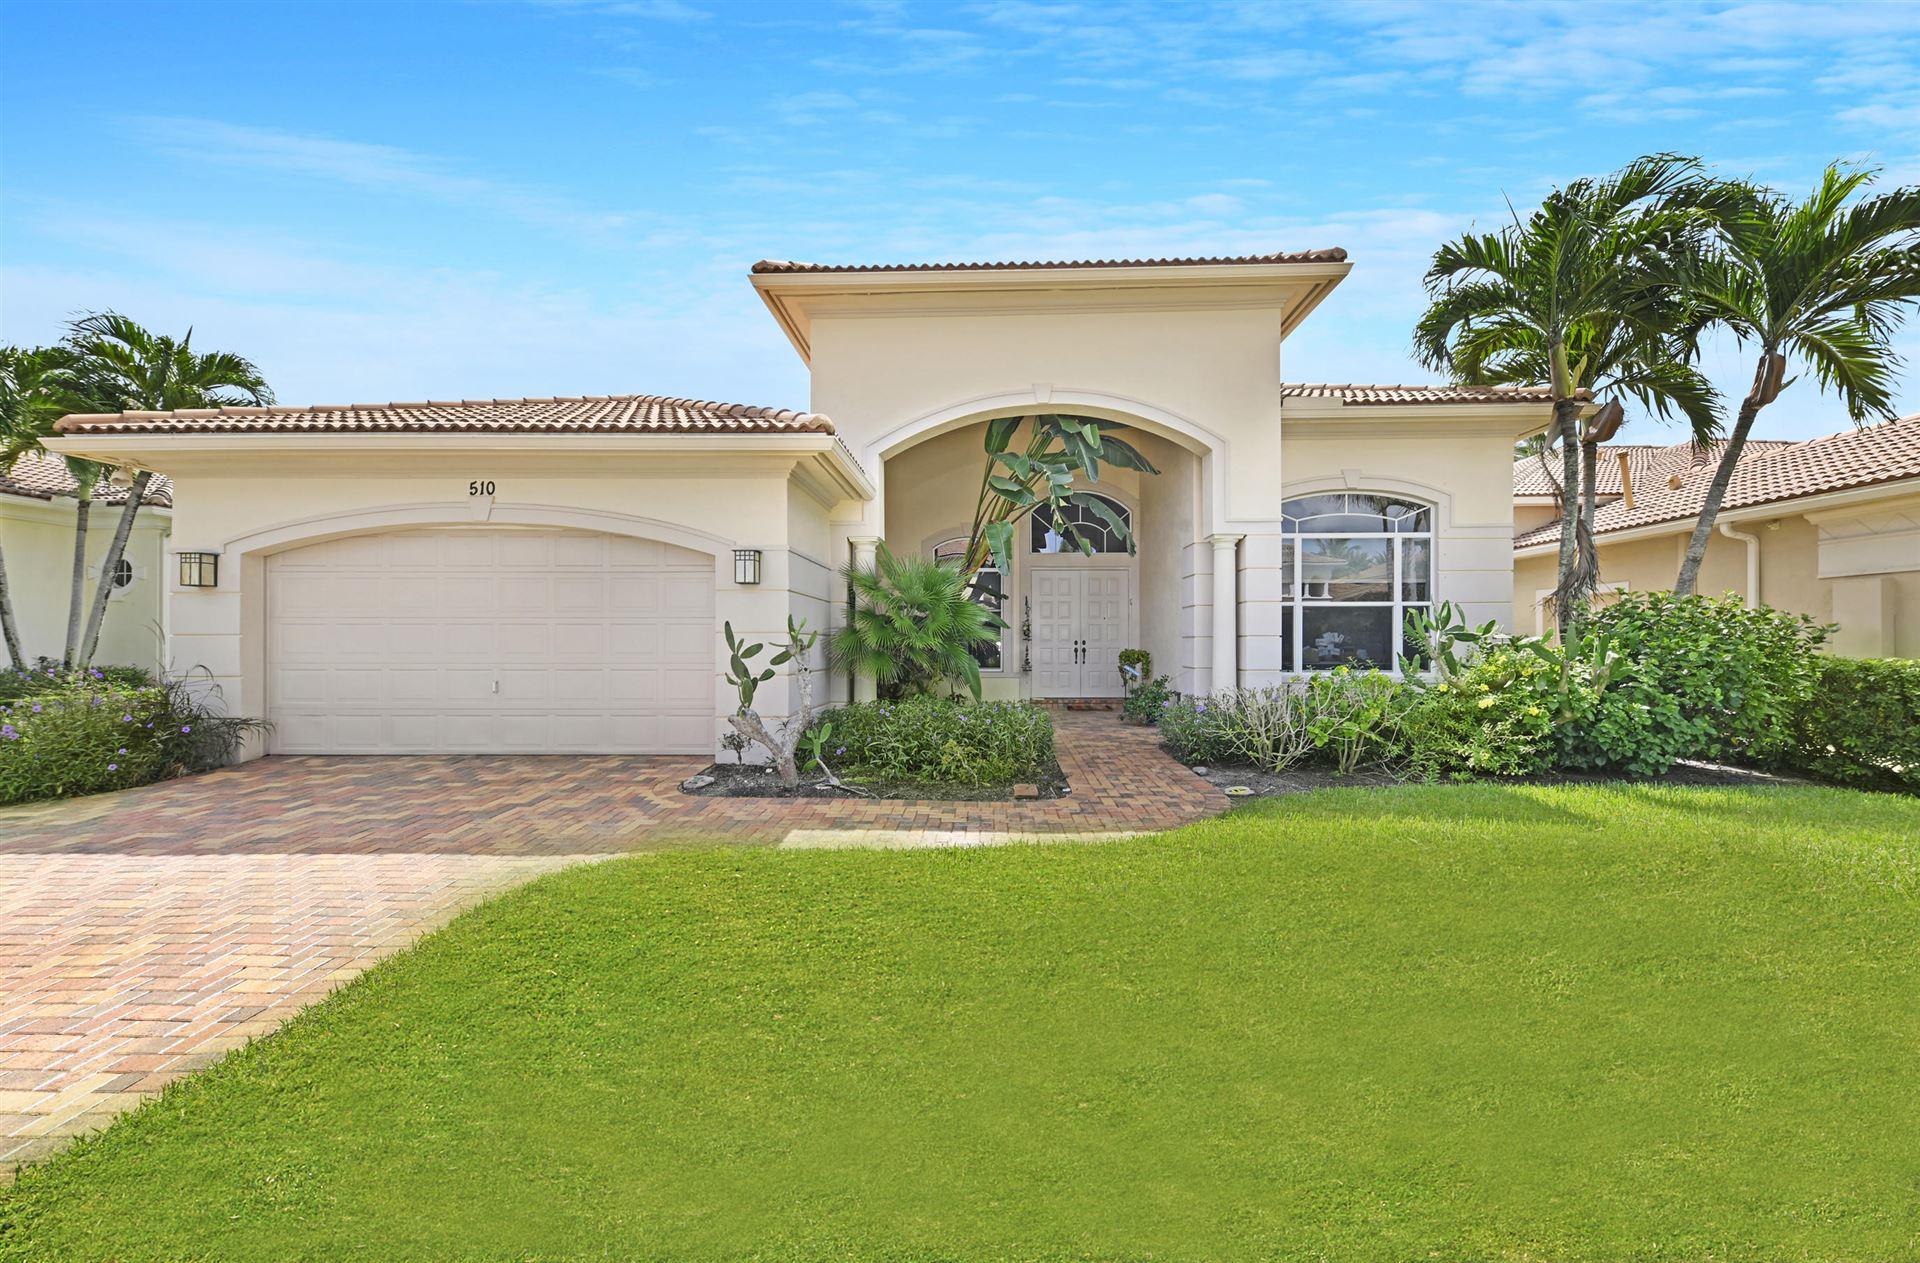 Photo of 510 Les Jardin Drive, Palm Beach Gardens, FL 33410 (MLS # RX-10667103)